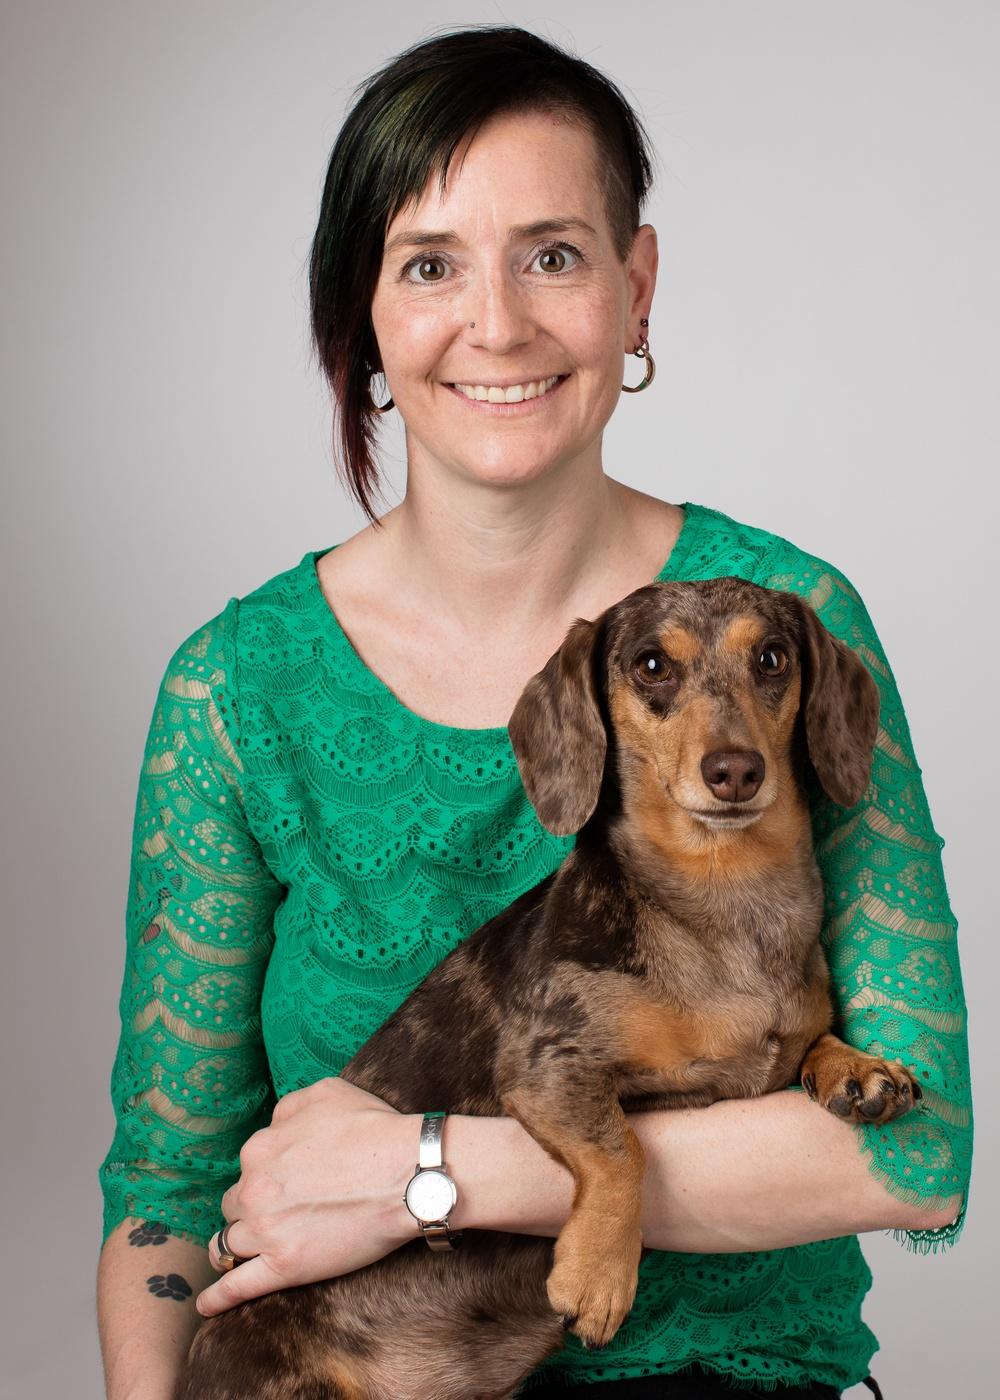 Djurskyddet Sveriges generalsekreterare Åsa Hagelstedt tillsammans med hennes hund Kanel.